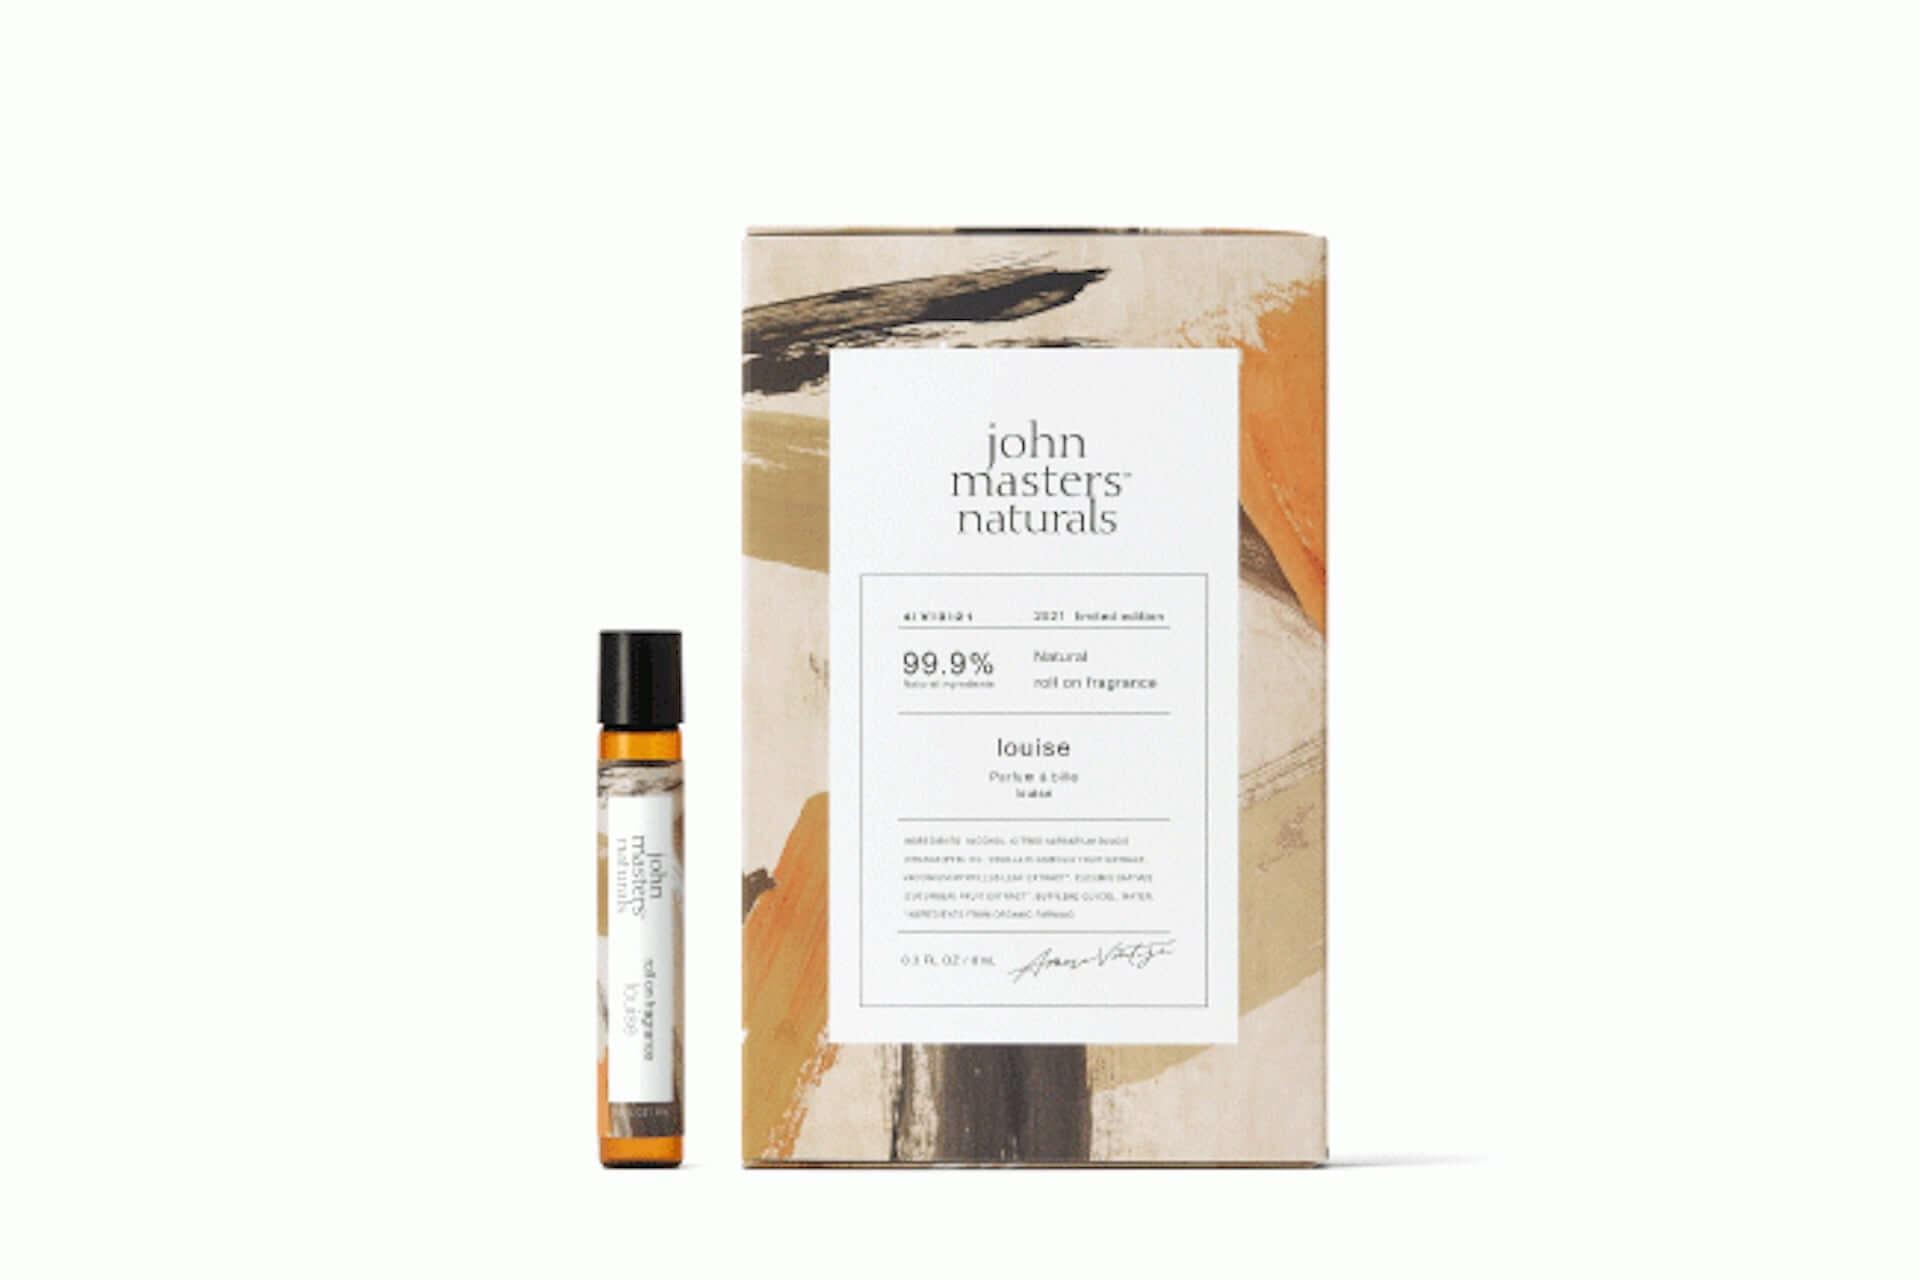 john masters organicsとAmeri VINTAGEのコラボフレグランスが数量限定で発売決定!オレンジとバニラの香りをブレンド lf210202_johnmasters-amerivintage_7-1920x1279